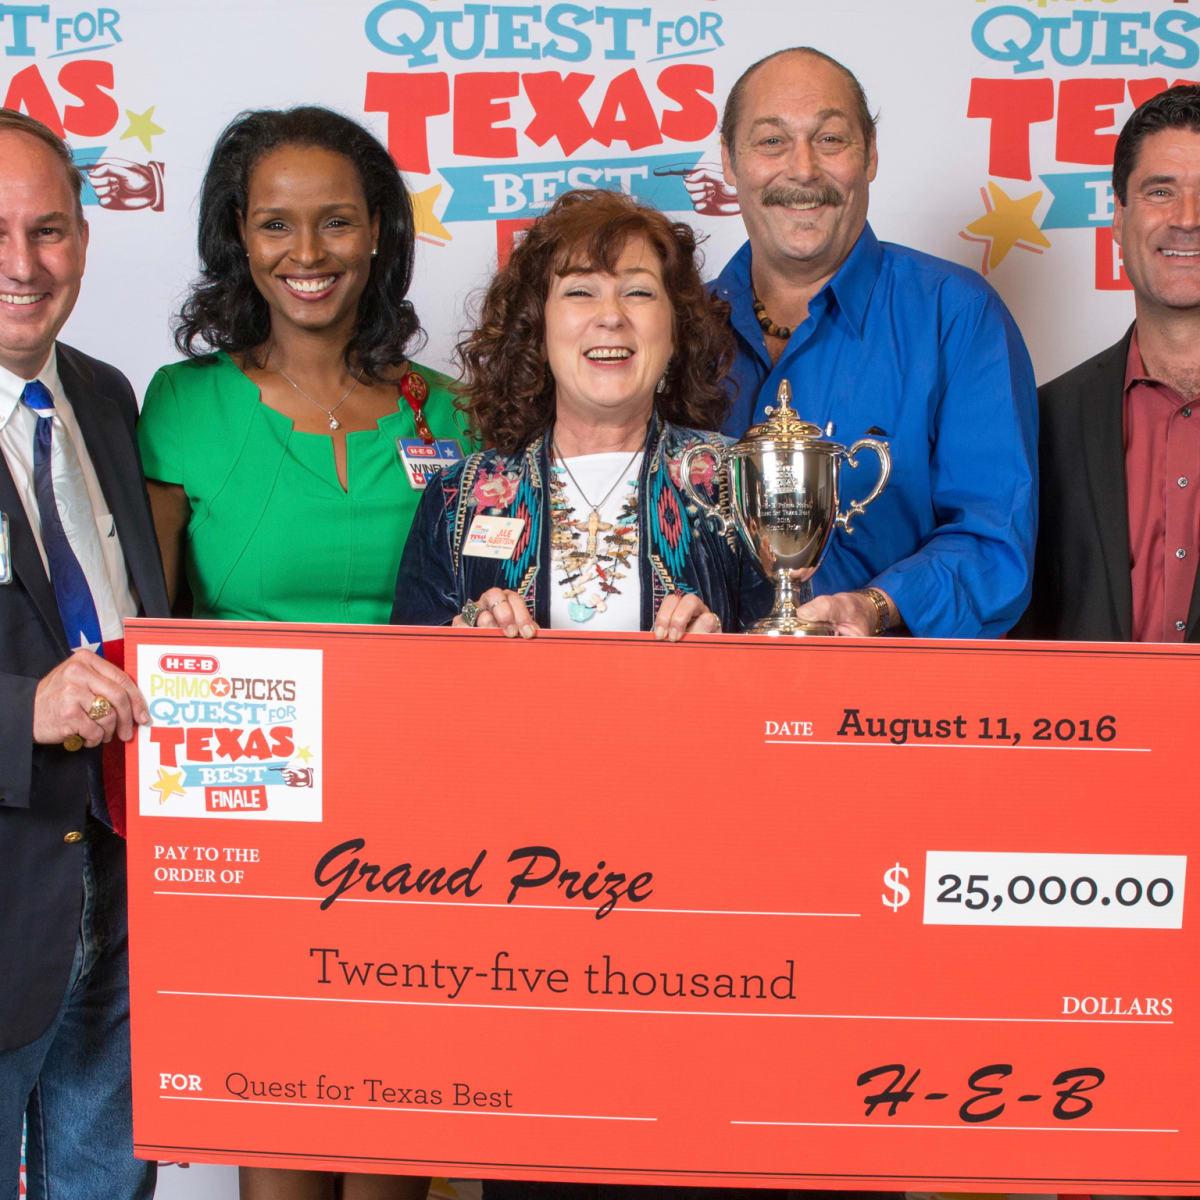 Jody Hall, Winell Herron, Julie Albertson (Texas Pie Company), Spencer Thomas-Schwarz, Reade Ahrens, Quest Texas Best